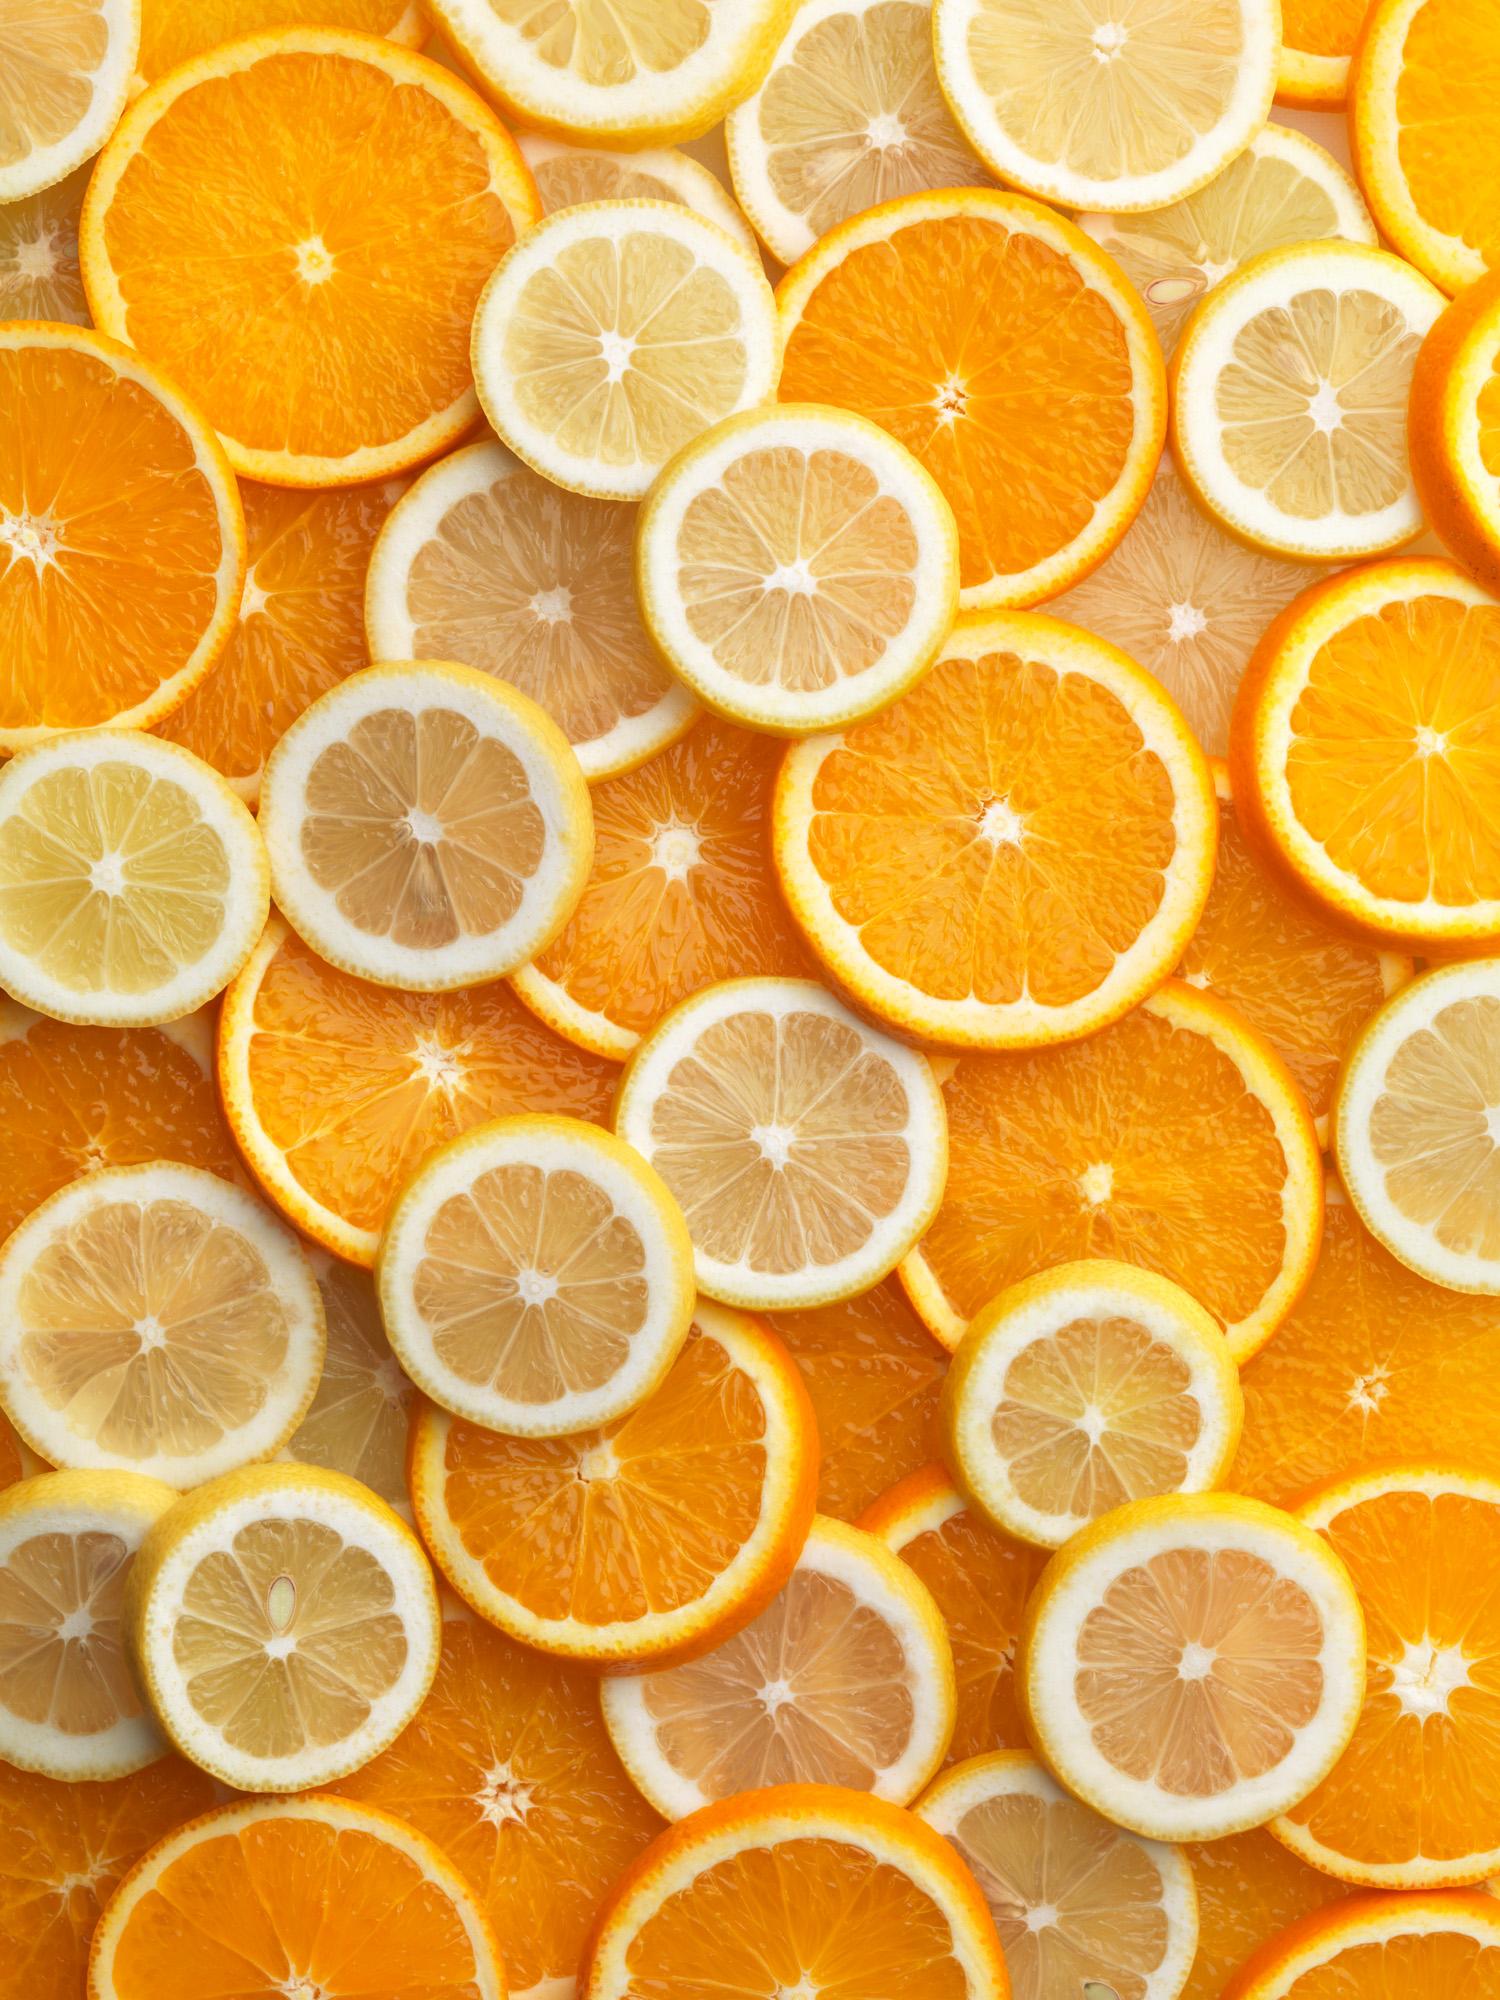 Harrods_Feb18_OrangesLemons_20.10.17_Opener3 - 004.jpg